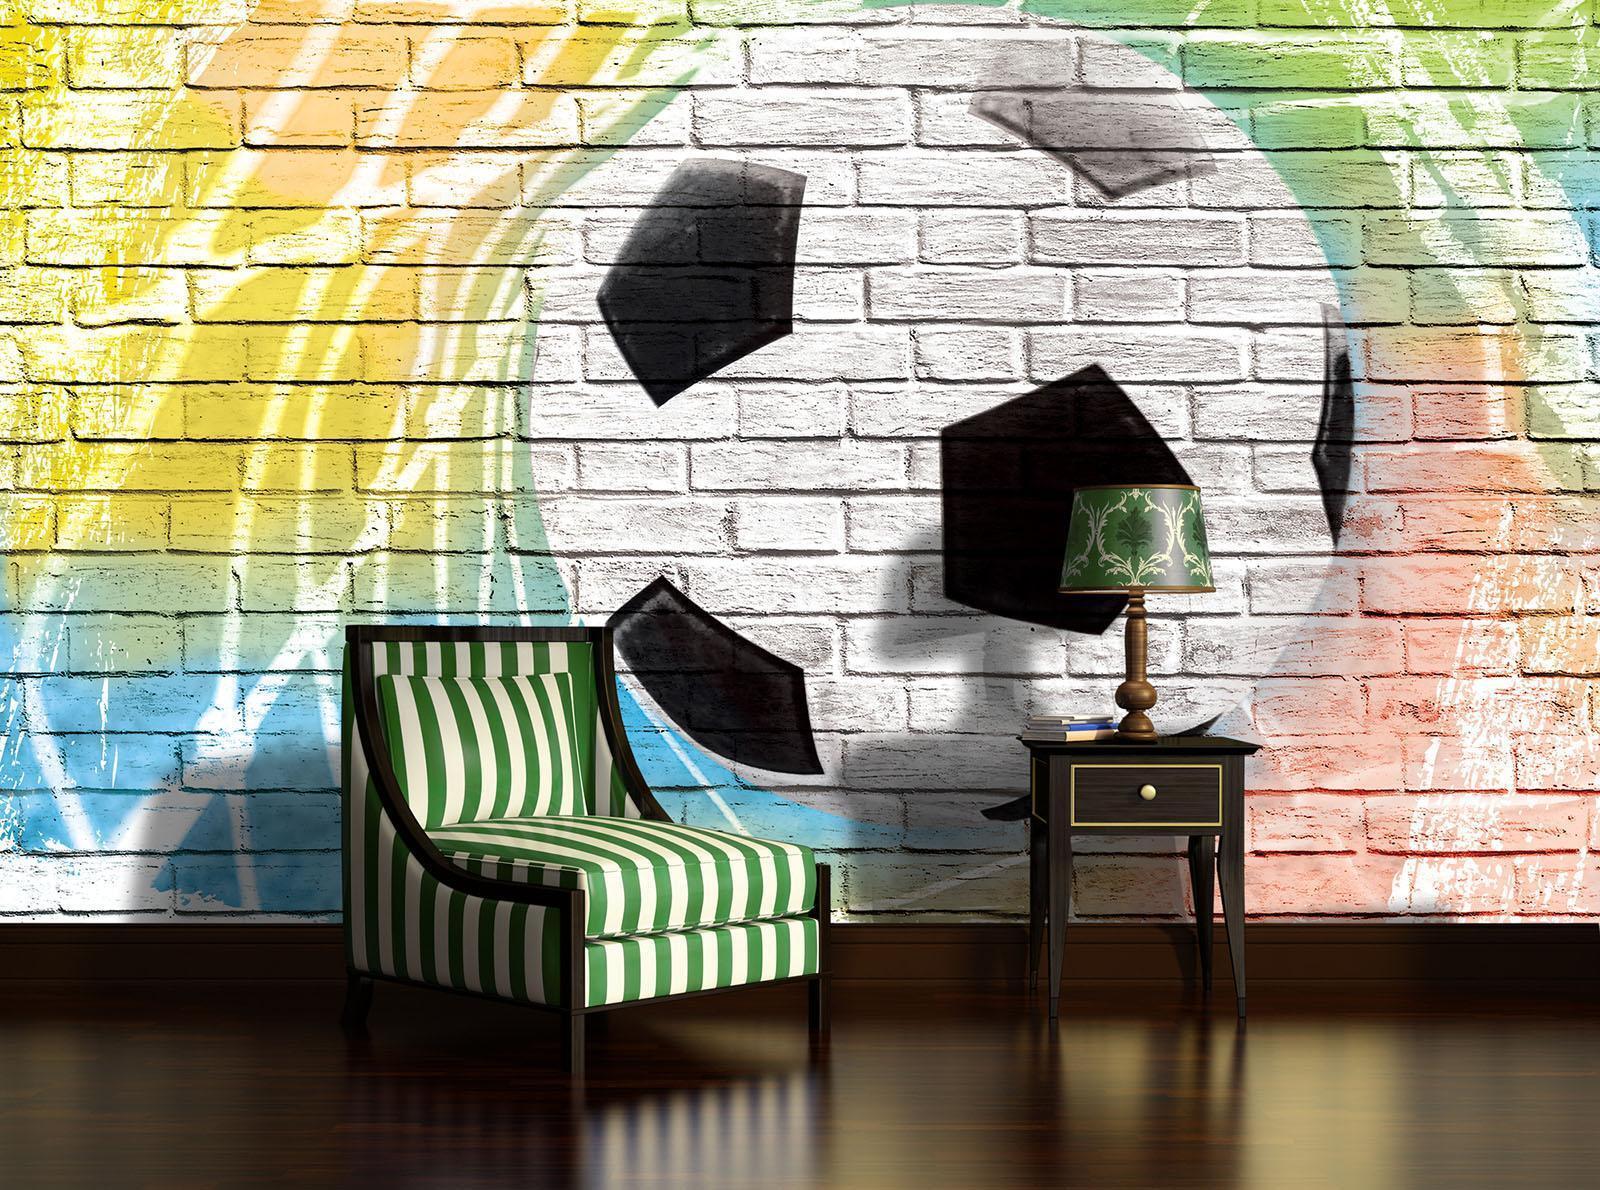 Vließ Fototapete Tapete Wandbild Photo Wallpaper Mural Graffiti - Fußball auf Zi